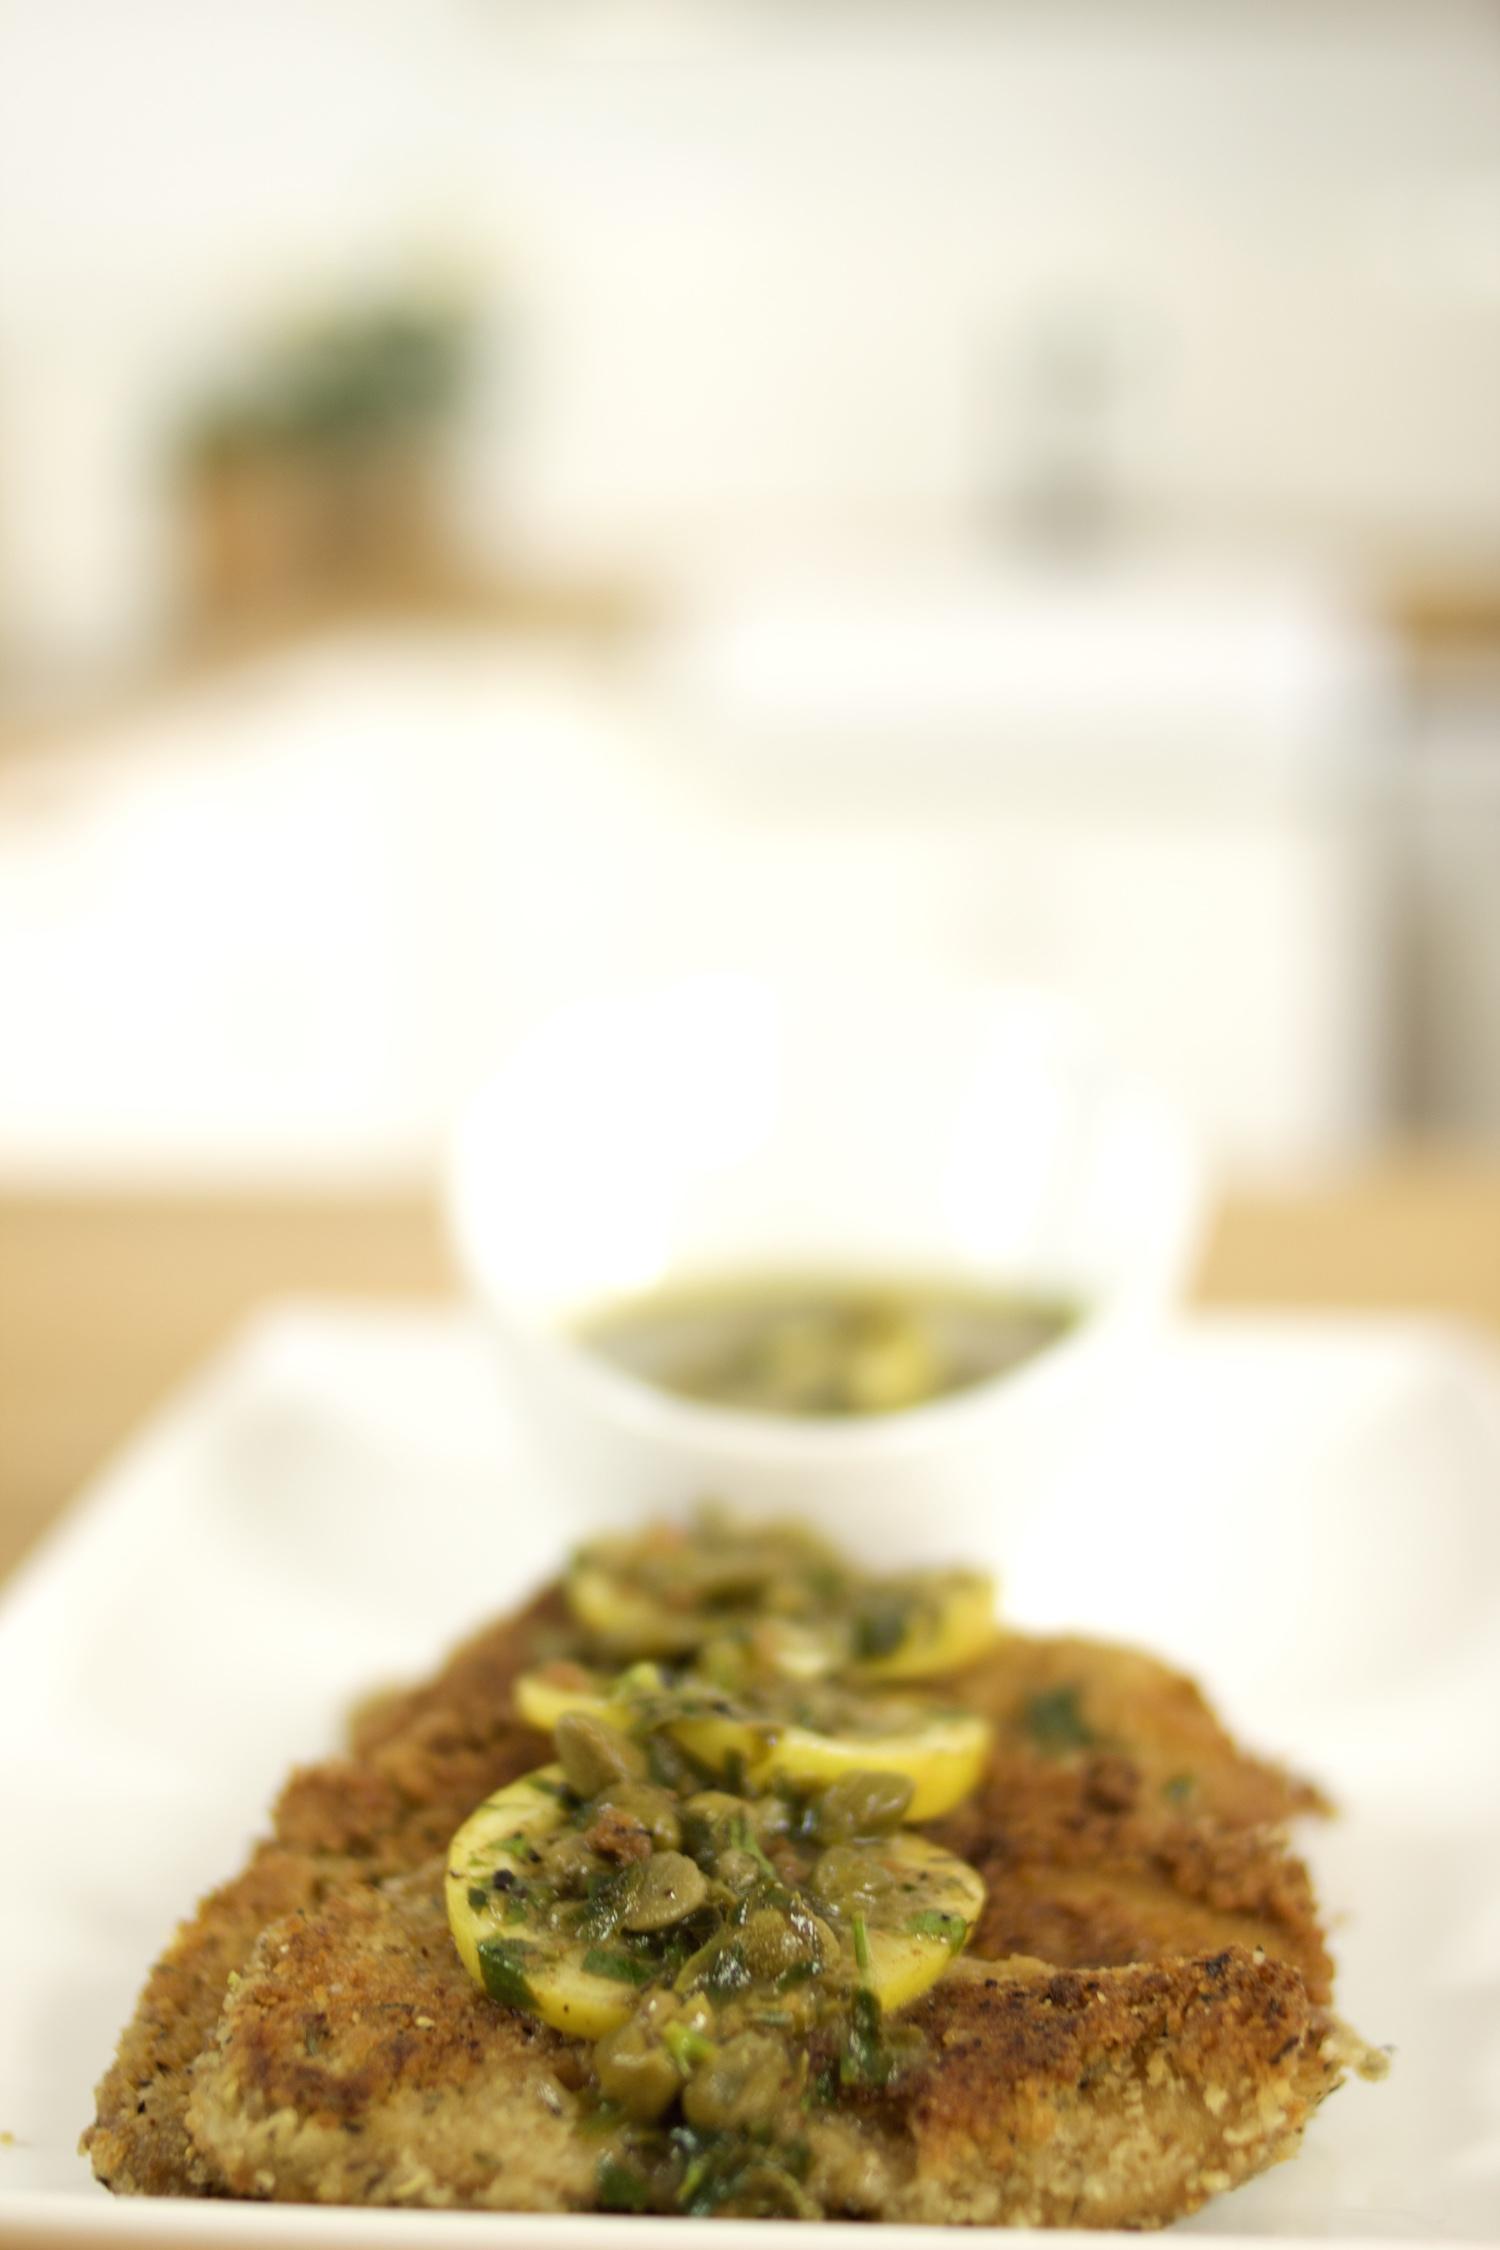 Super crispy vegan scaloppini | Vegan main dishes: Seitan scaloppini piccata | Brownble